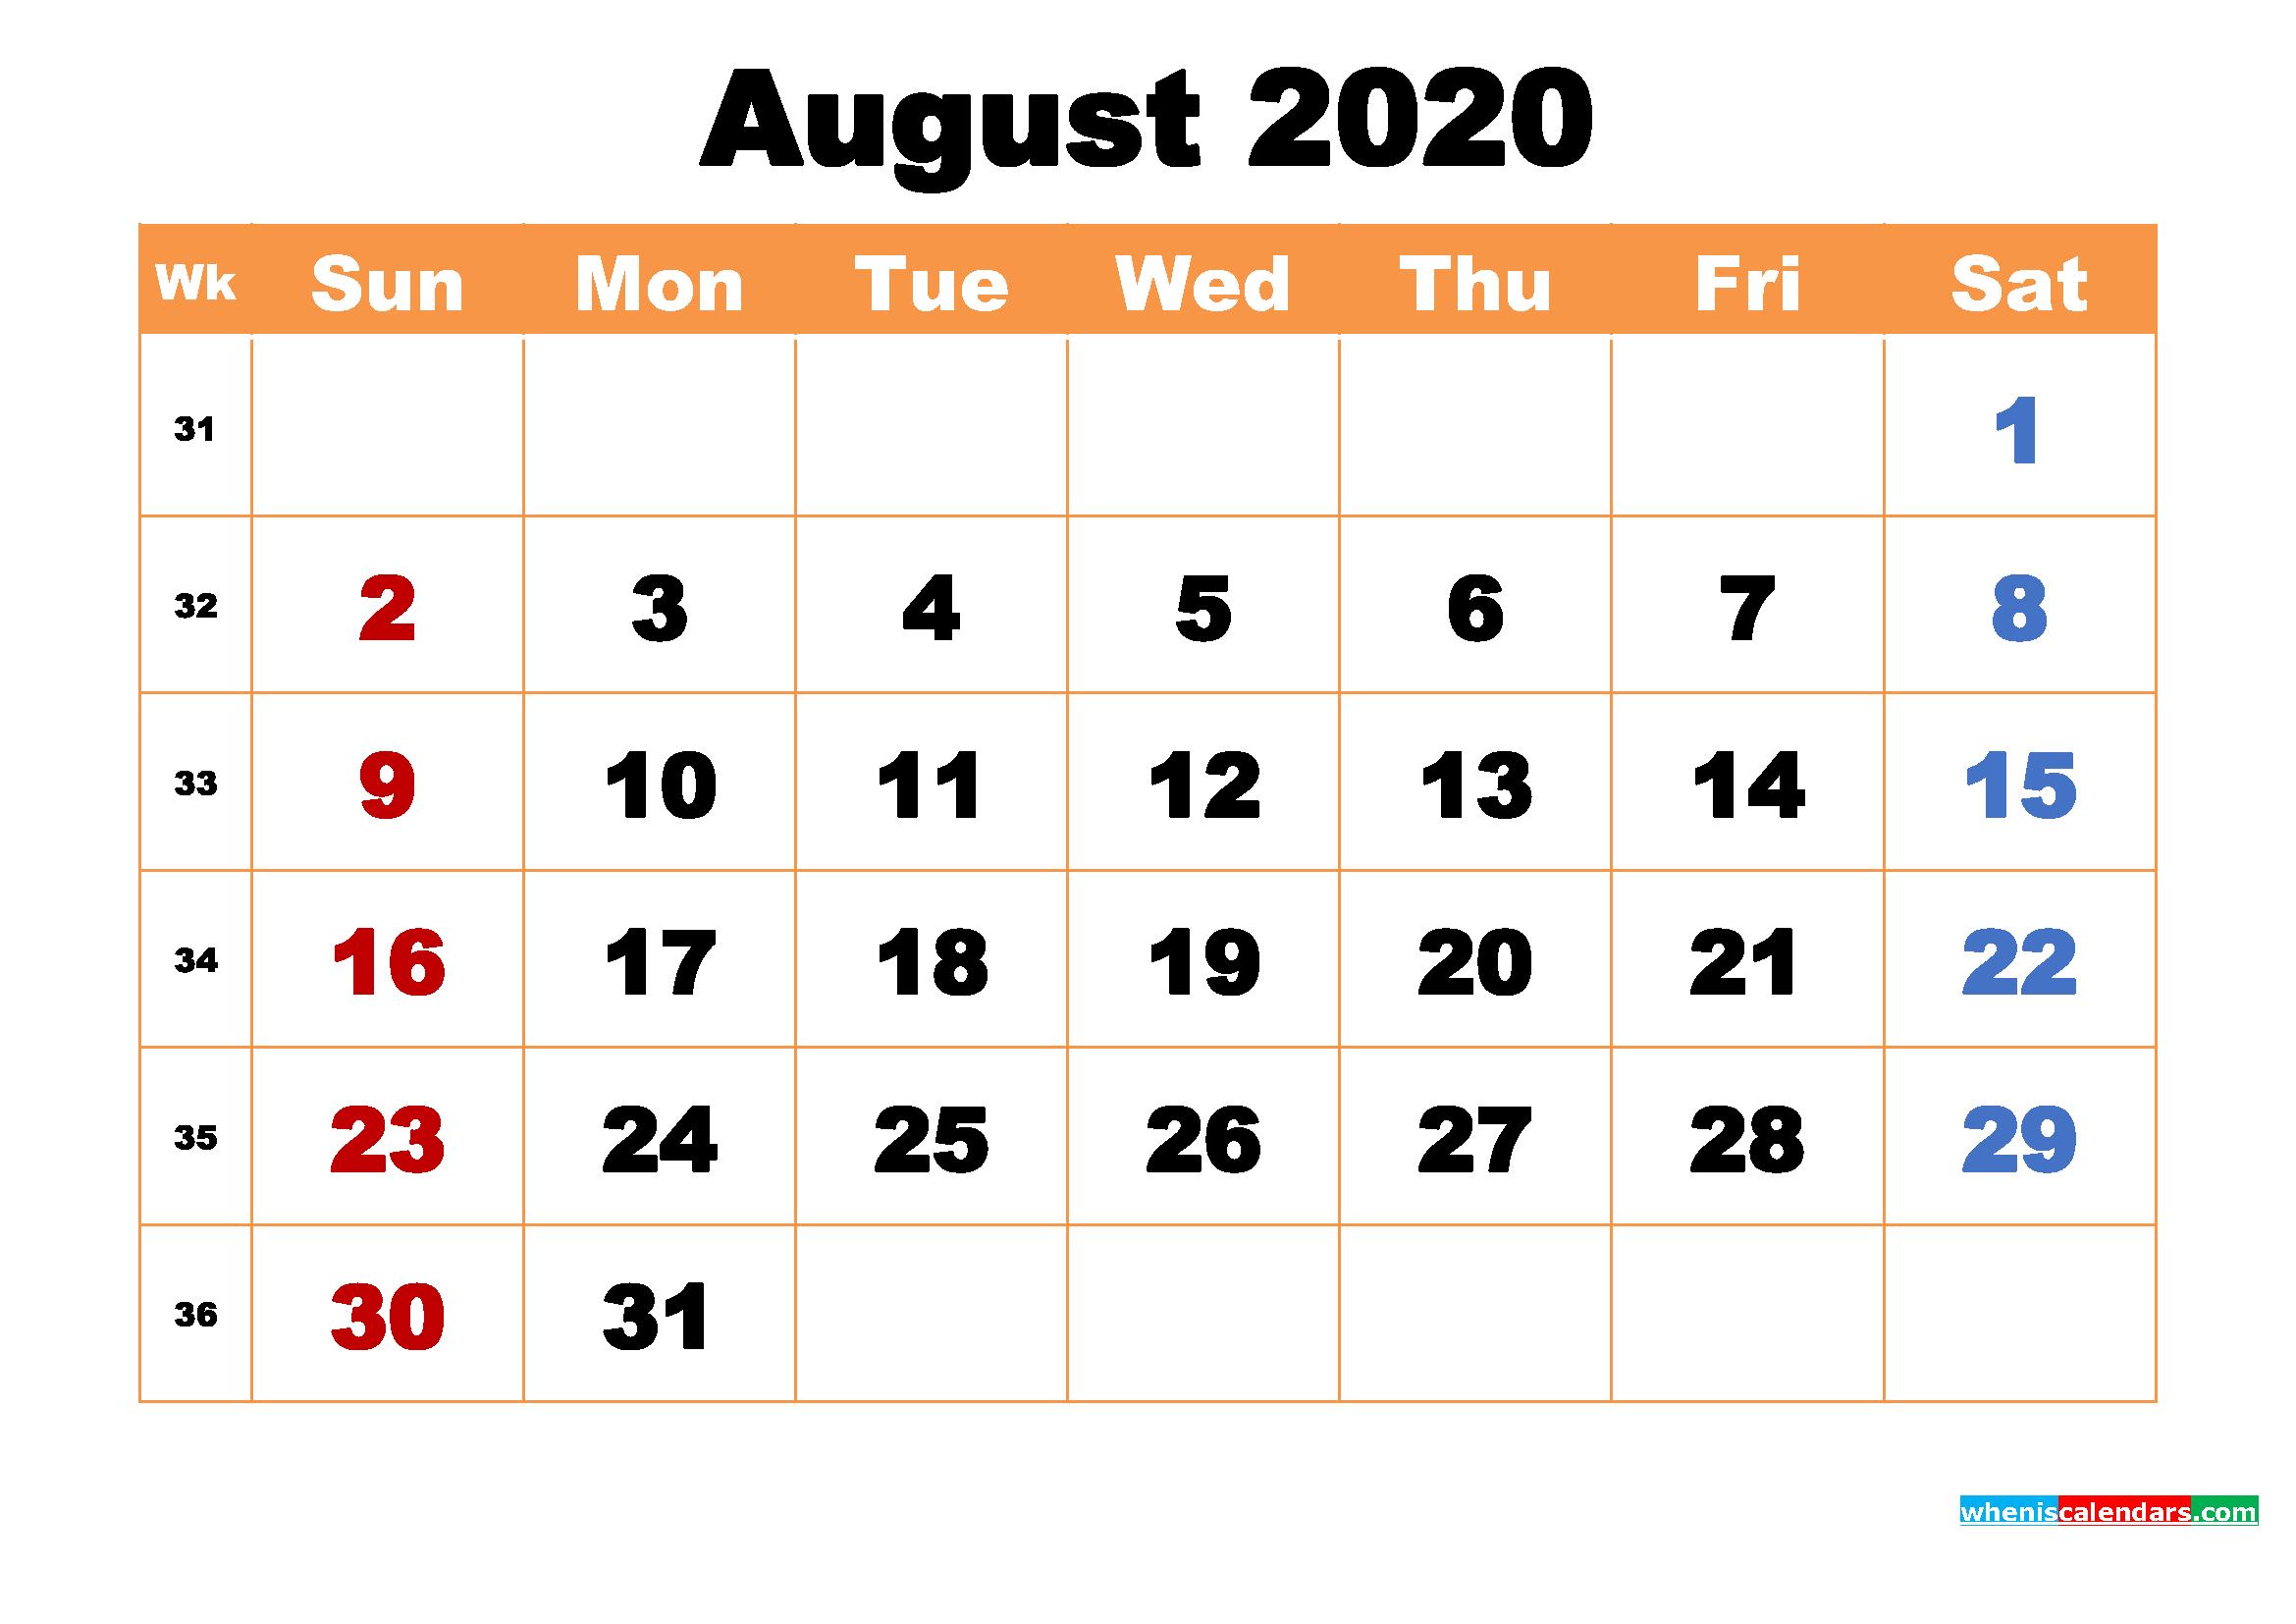 August 2020 Desktop Calendar Free Download